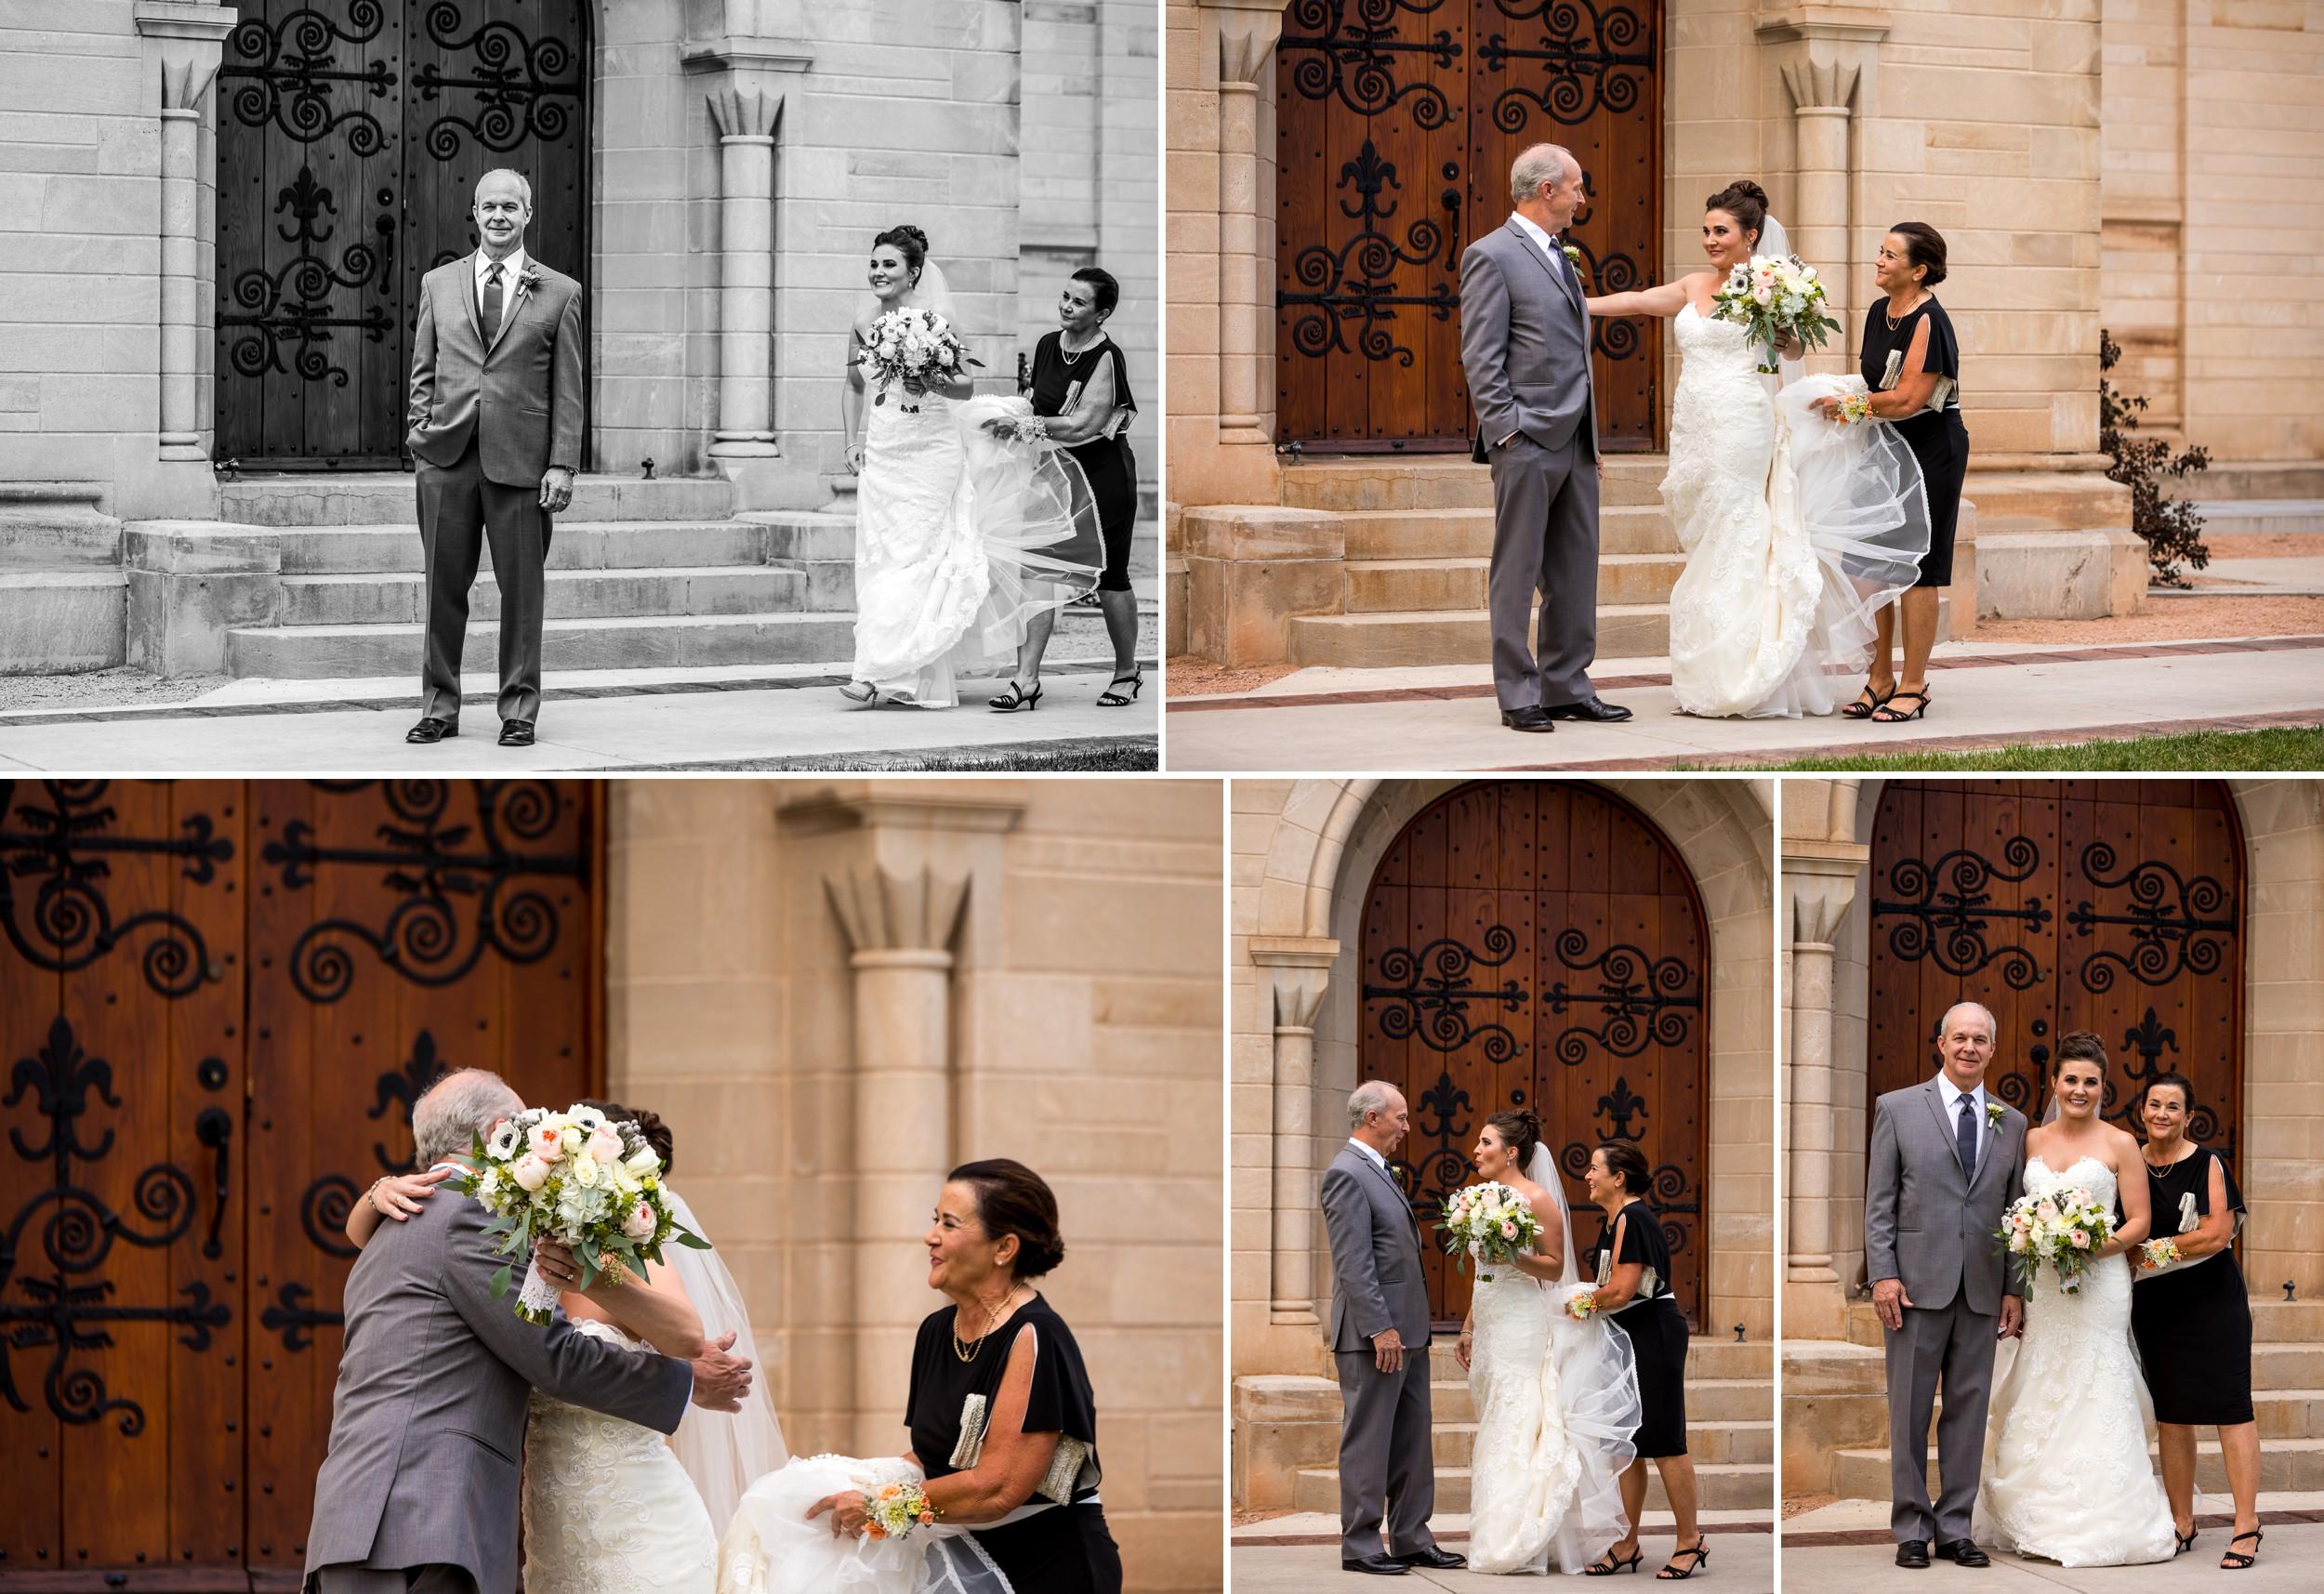 Criddle Wedding 4.jpg